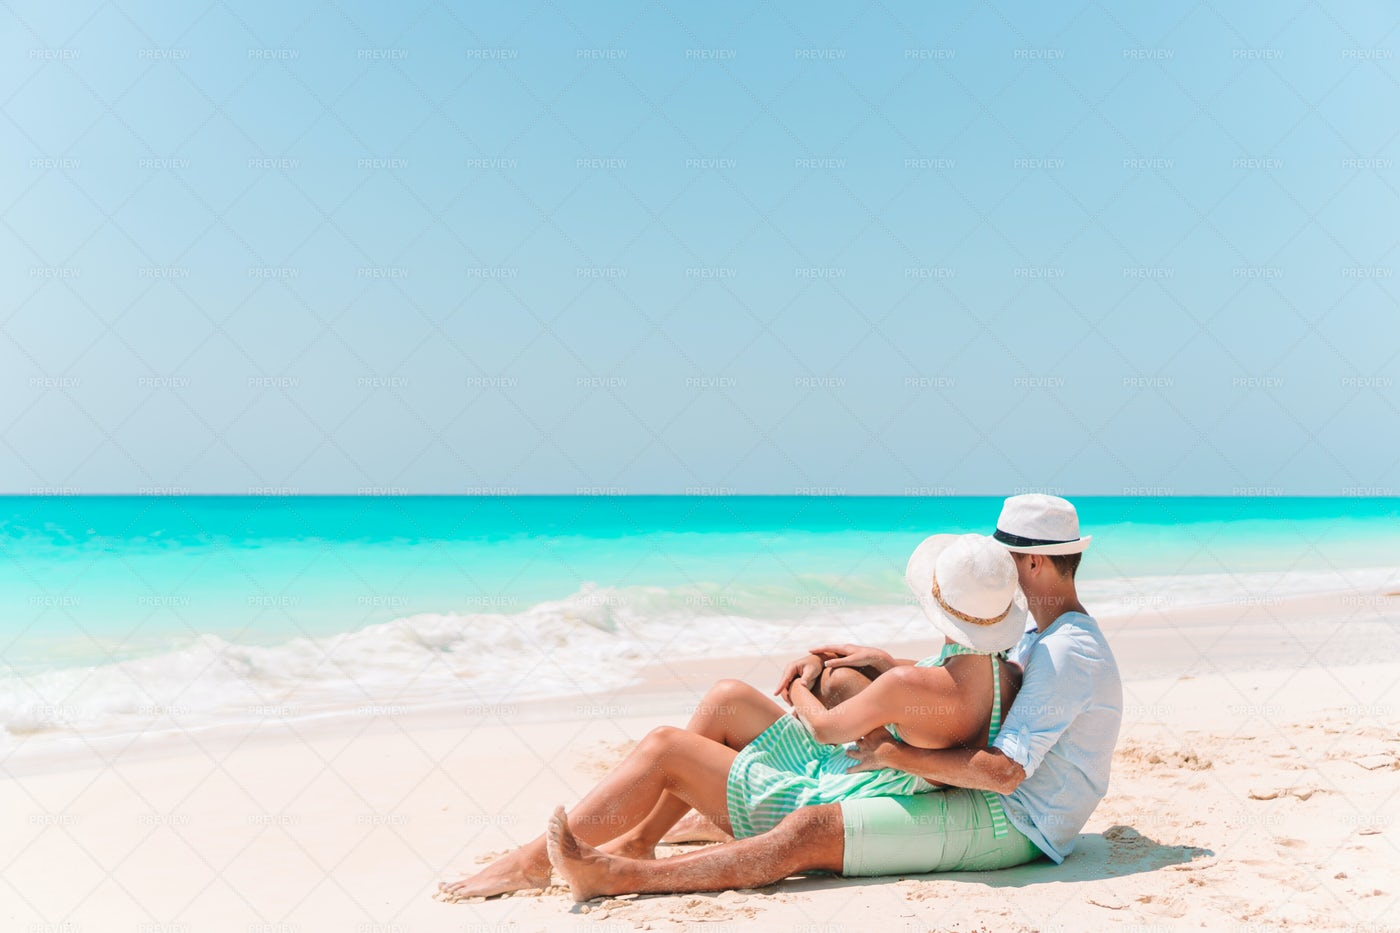 Couple Curled Up On The Beach: Stock Photos